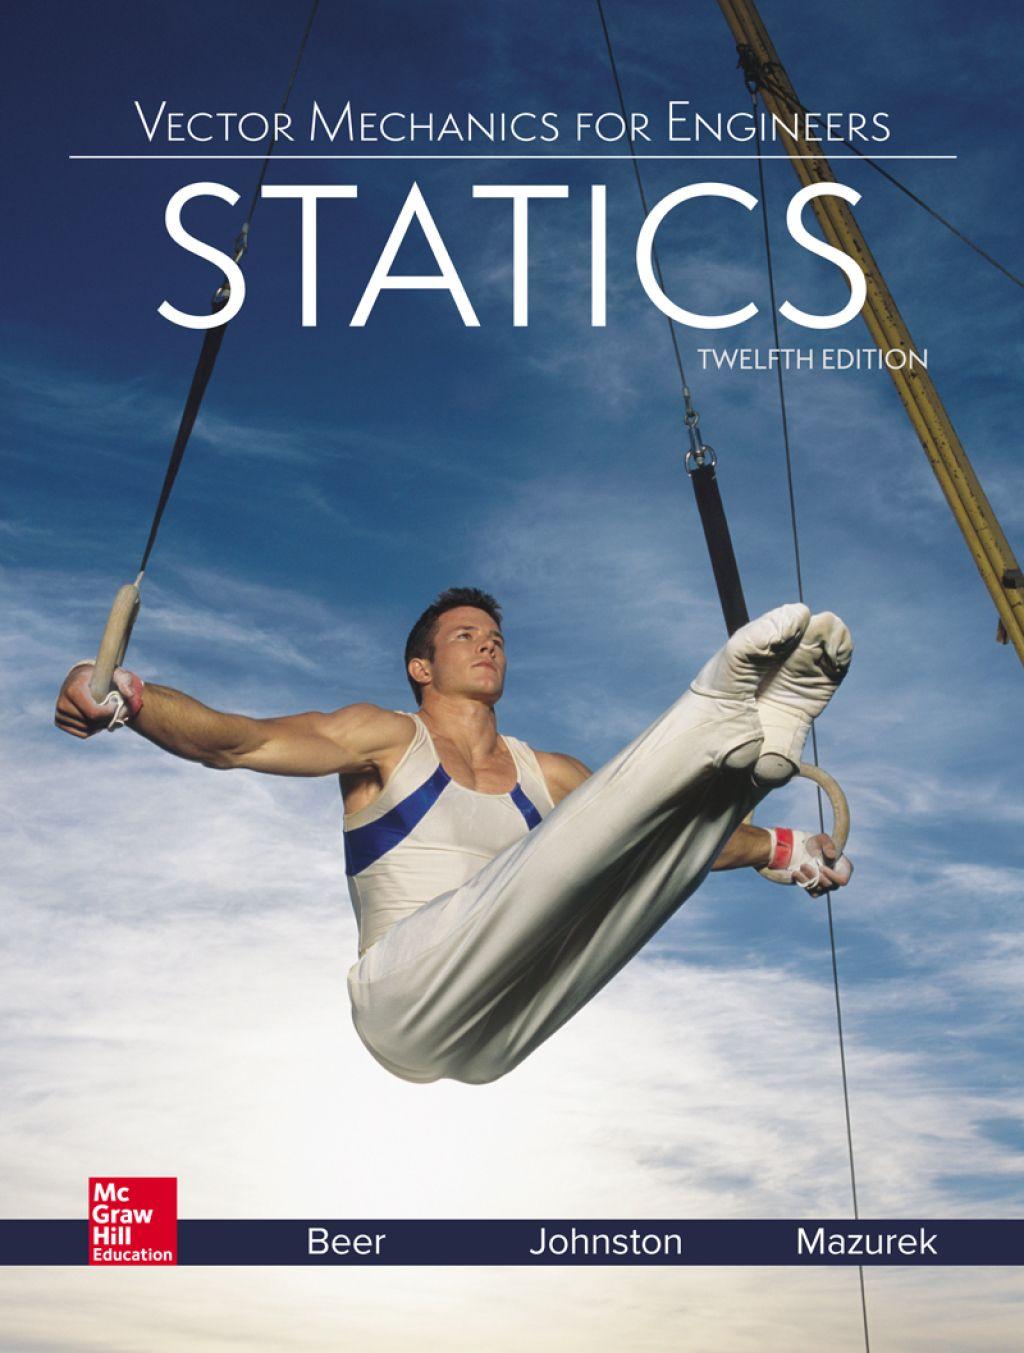 Vector Mechanics For Engineers Statics 12th Edition Ebook Rental In 2021 Vector Mechanics Engineering Mechanic